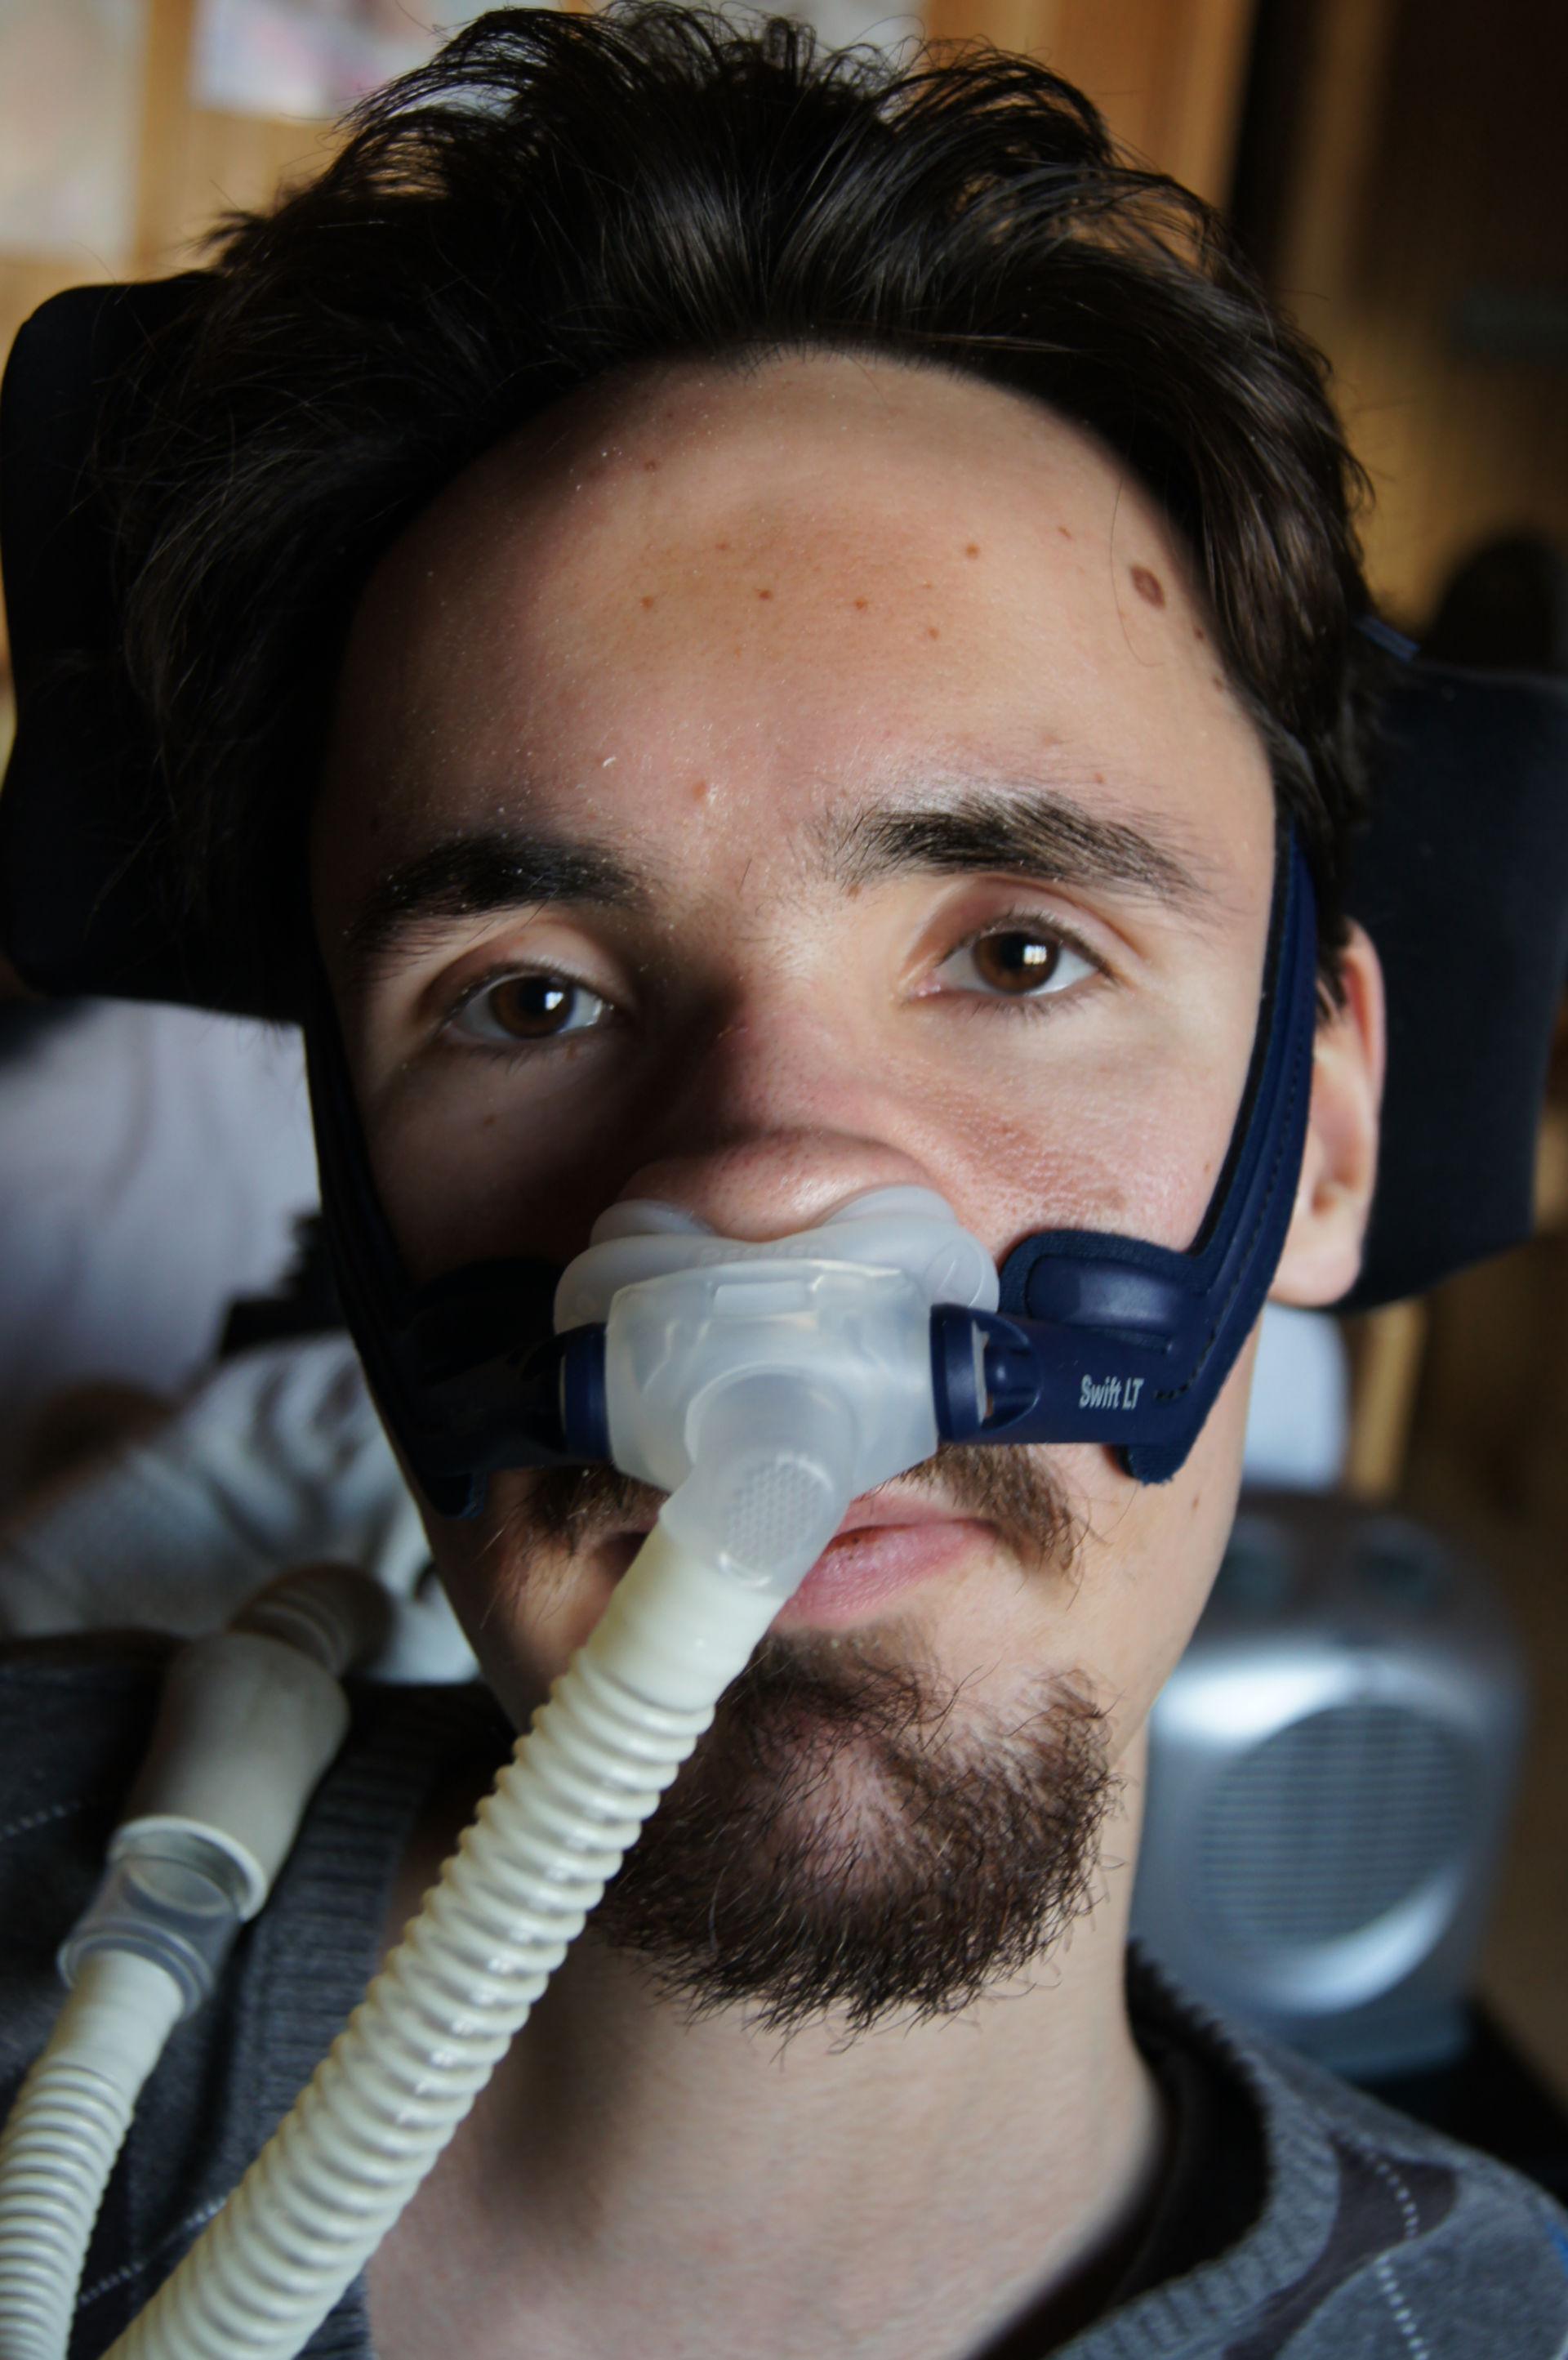 Maschera respiratoria nasale